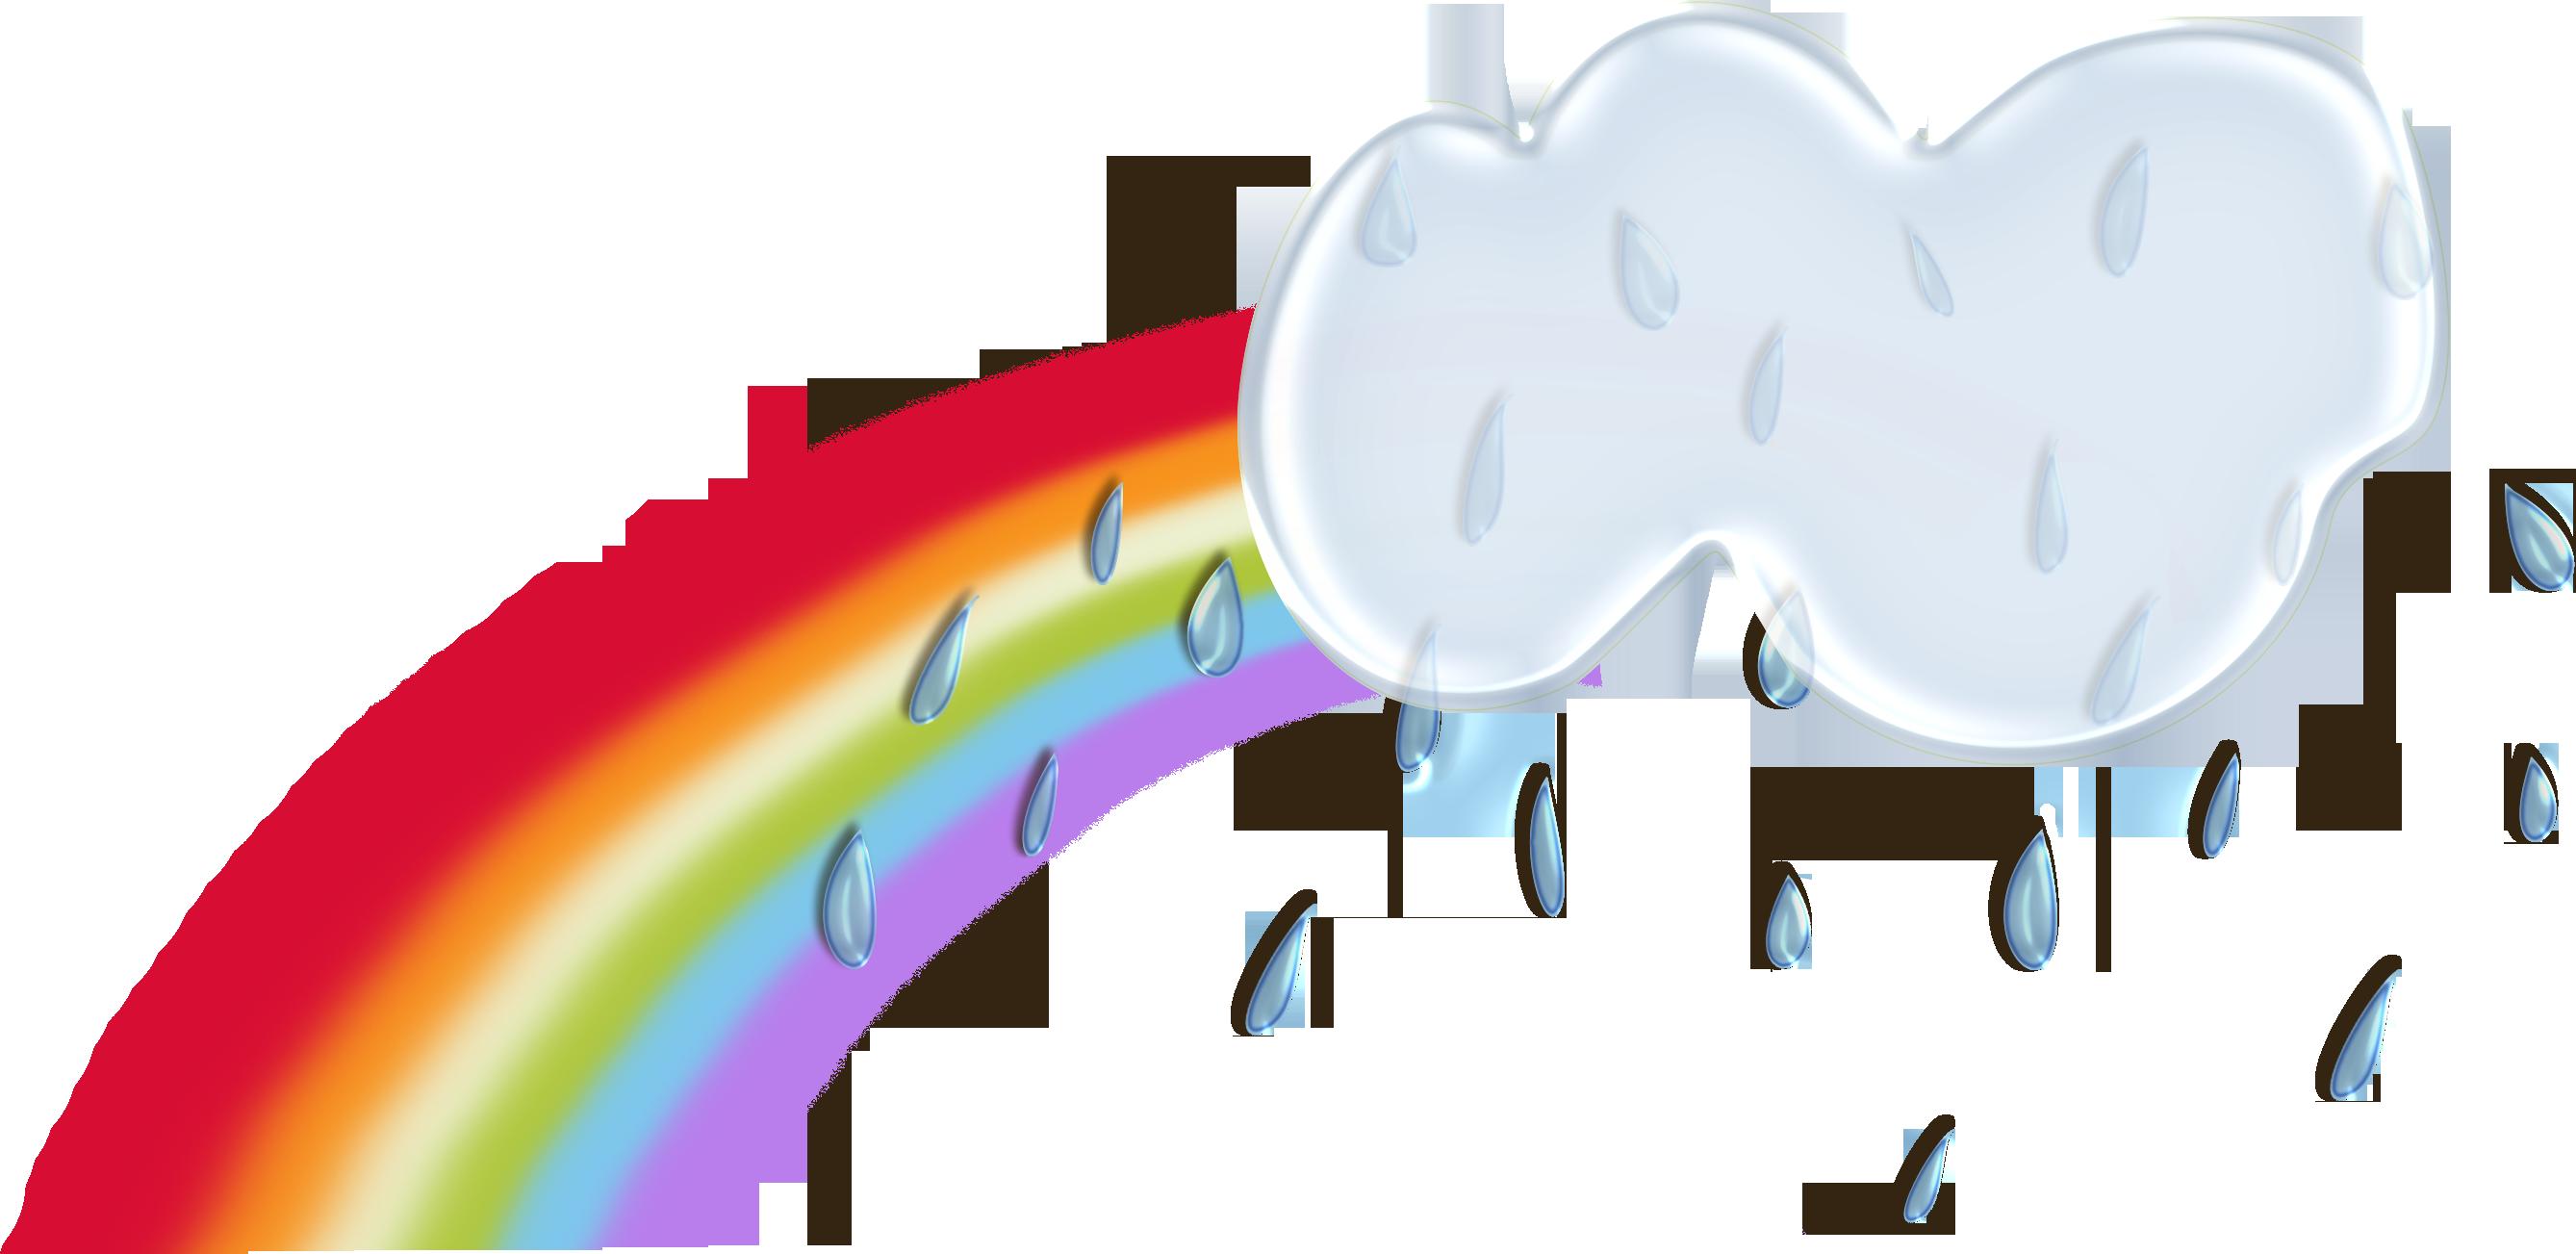 Облако с дождиком анимация на прозрачном фоне фон для презентации